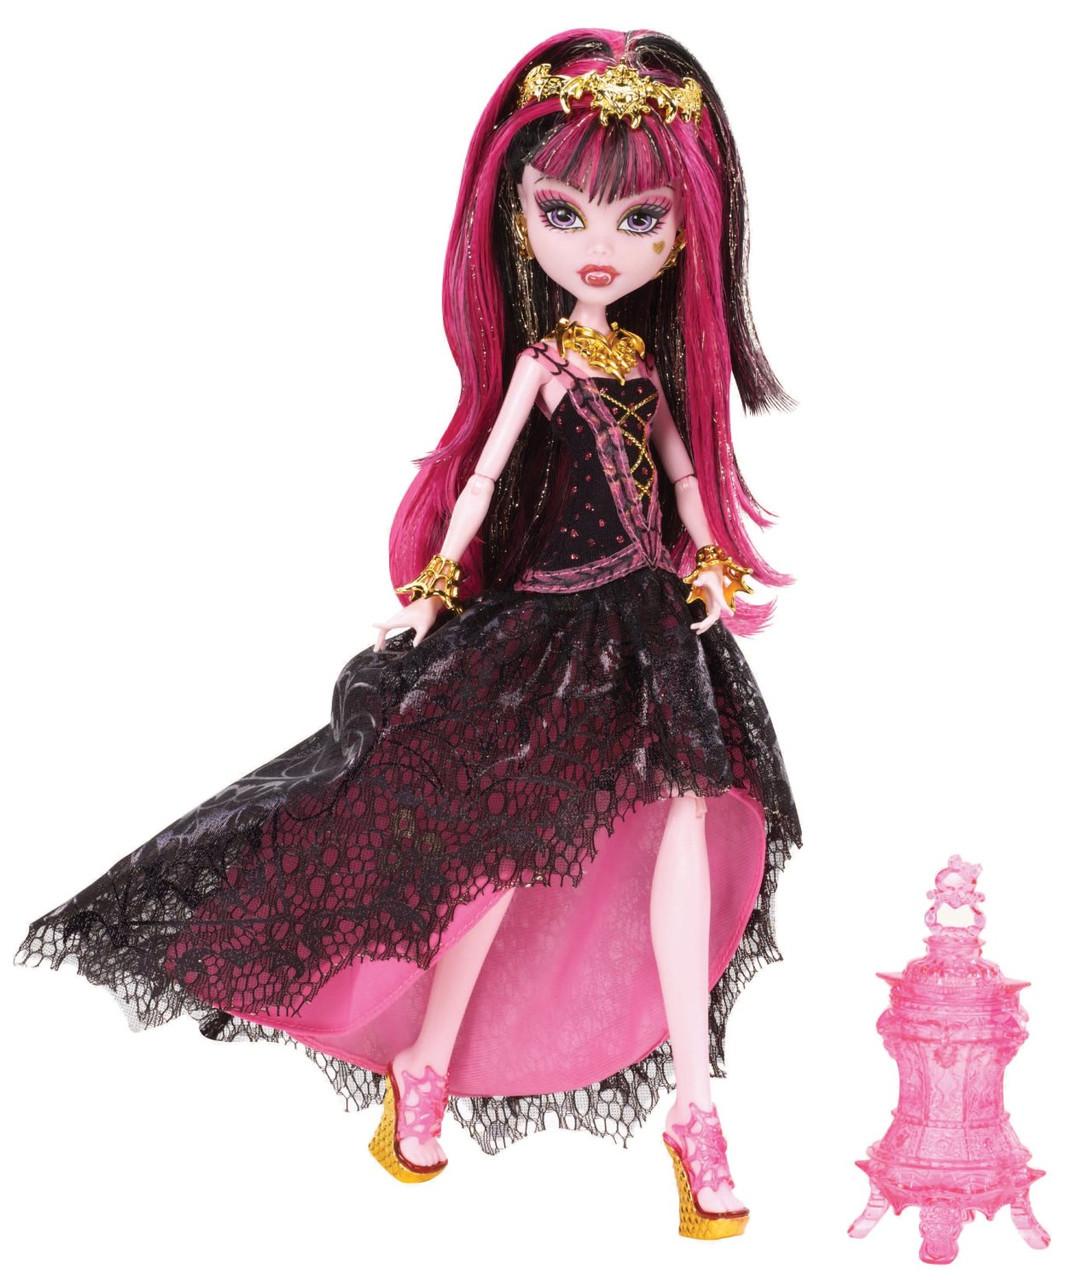 Monster High Дракулаура из серии 13 Желаний 13 Wishes Haunt the Casbah Draculaura Doll